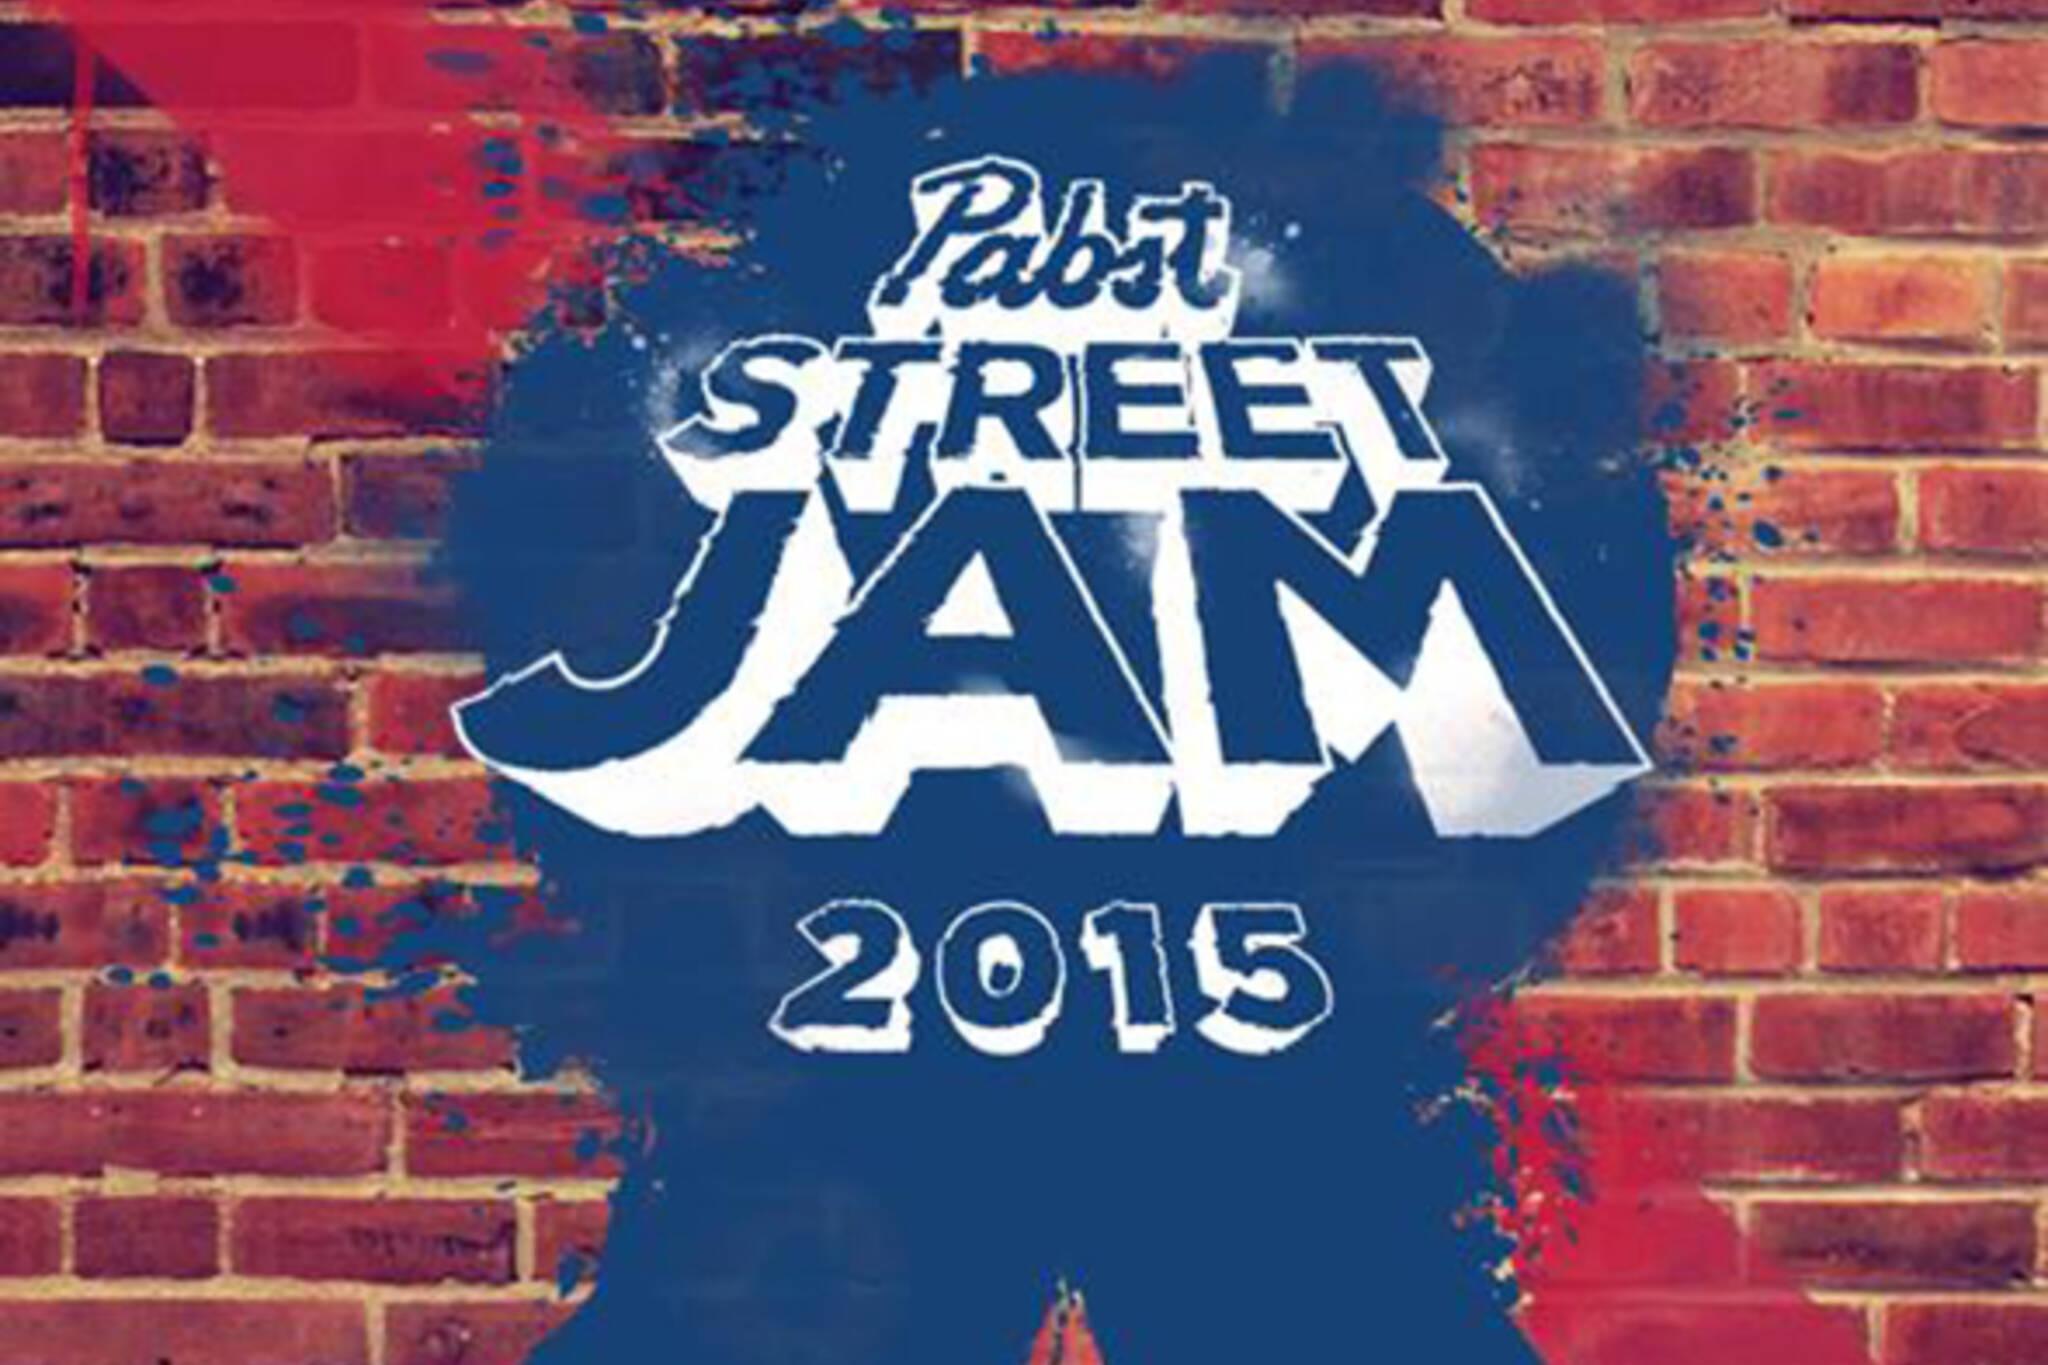 Pabst toronto street jam